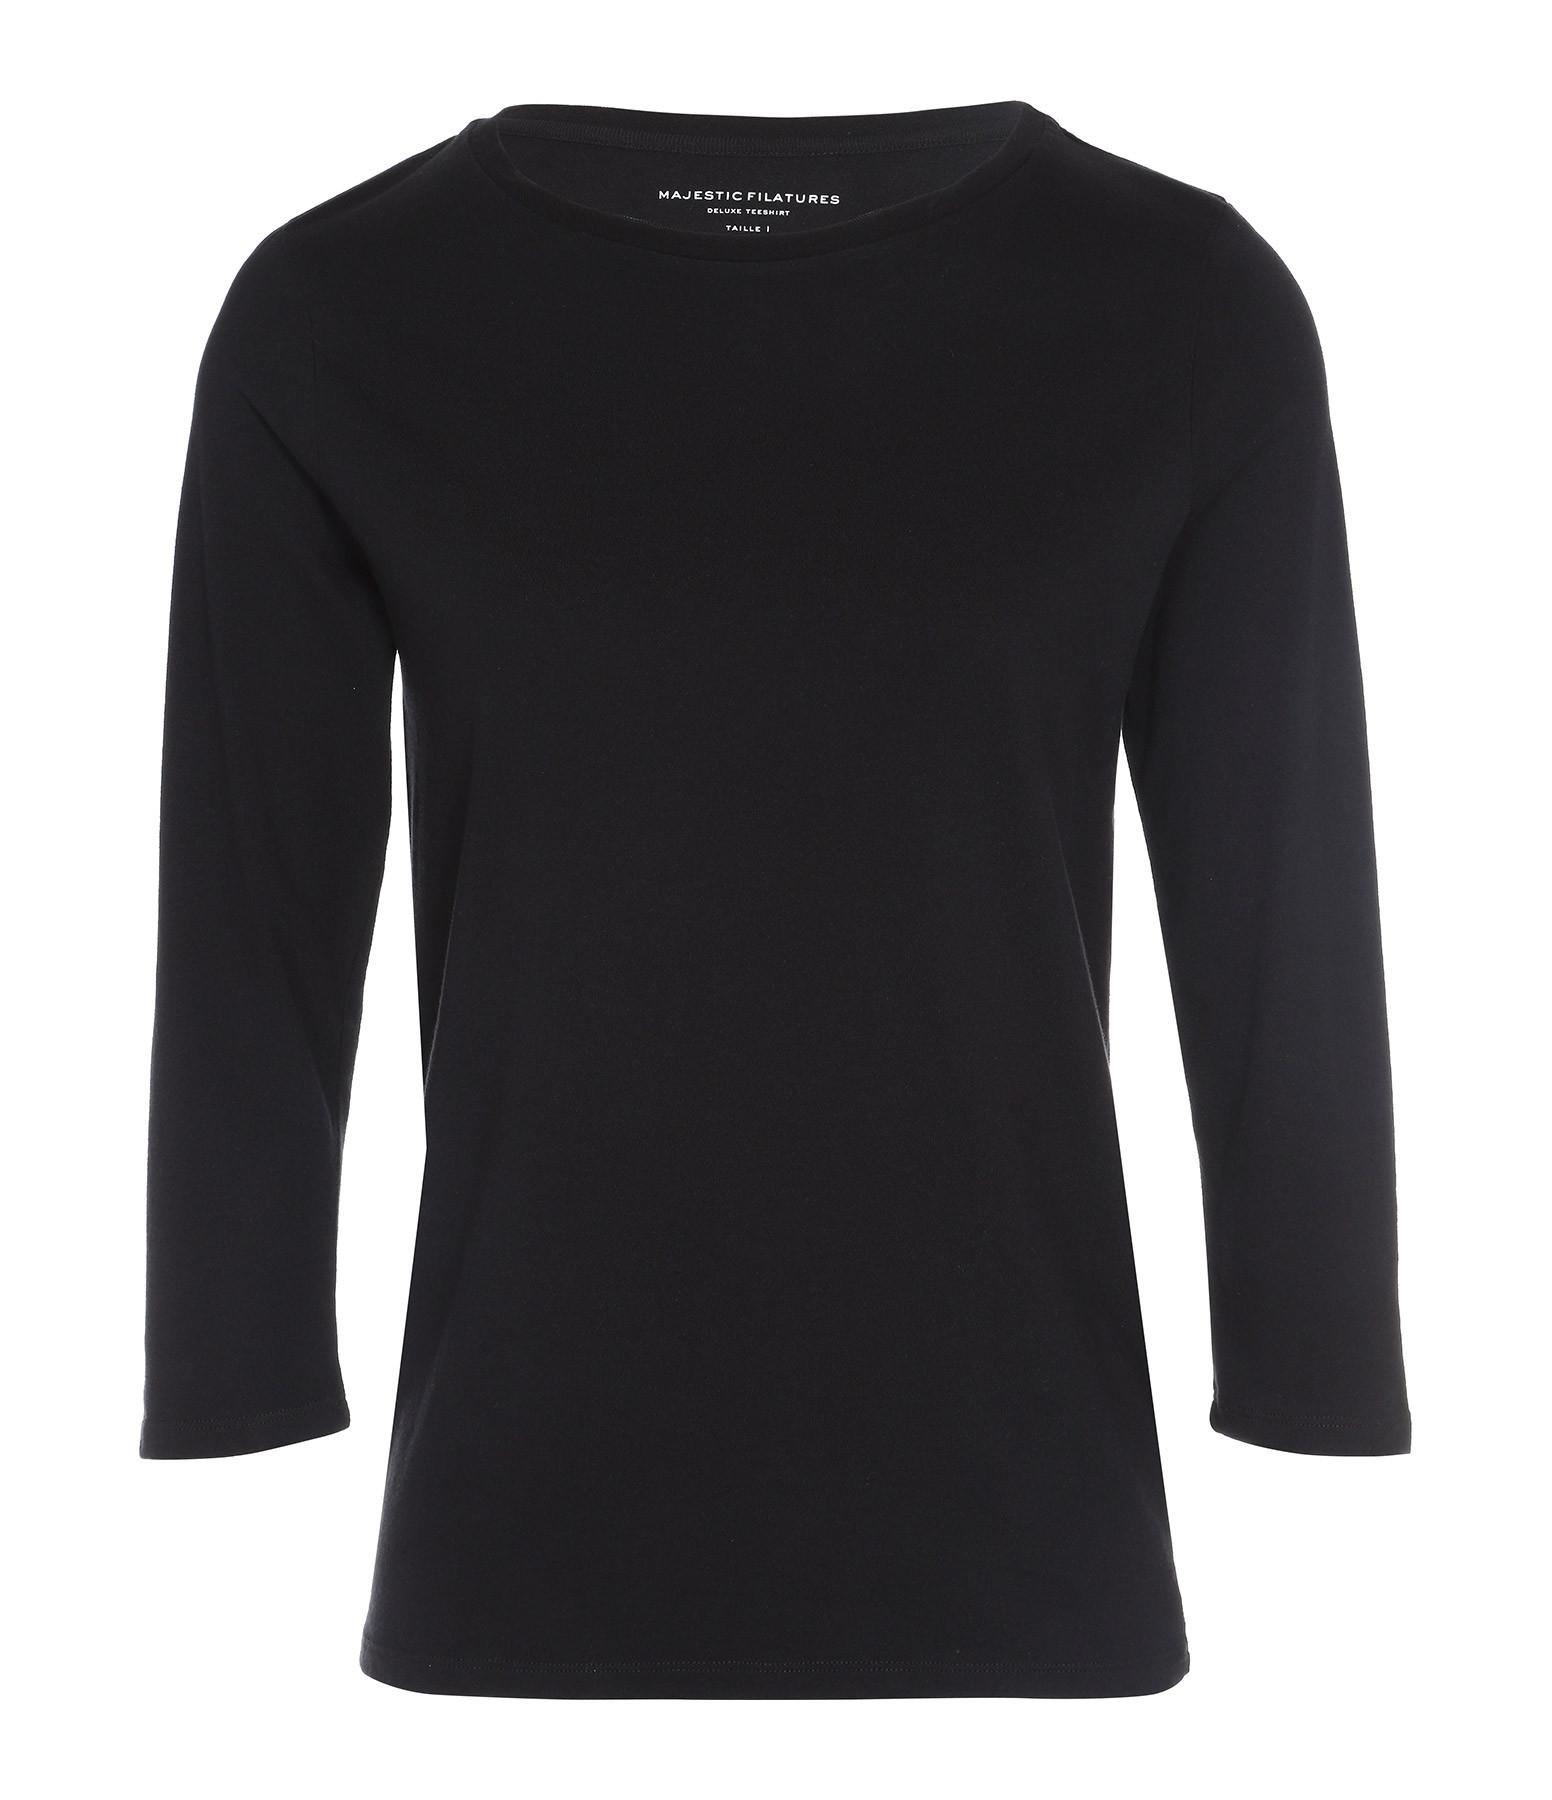 MAJESTIC FILATURES - Tee-shirt Col Bateau Noir